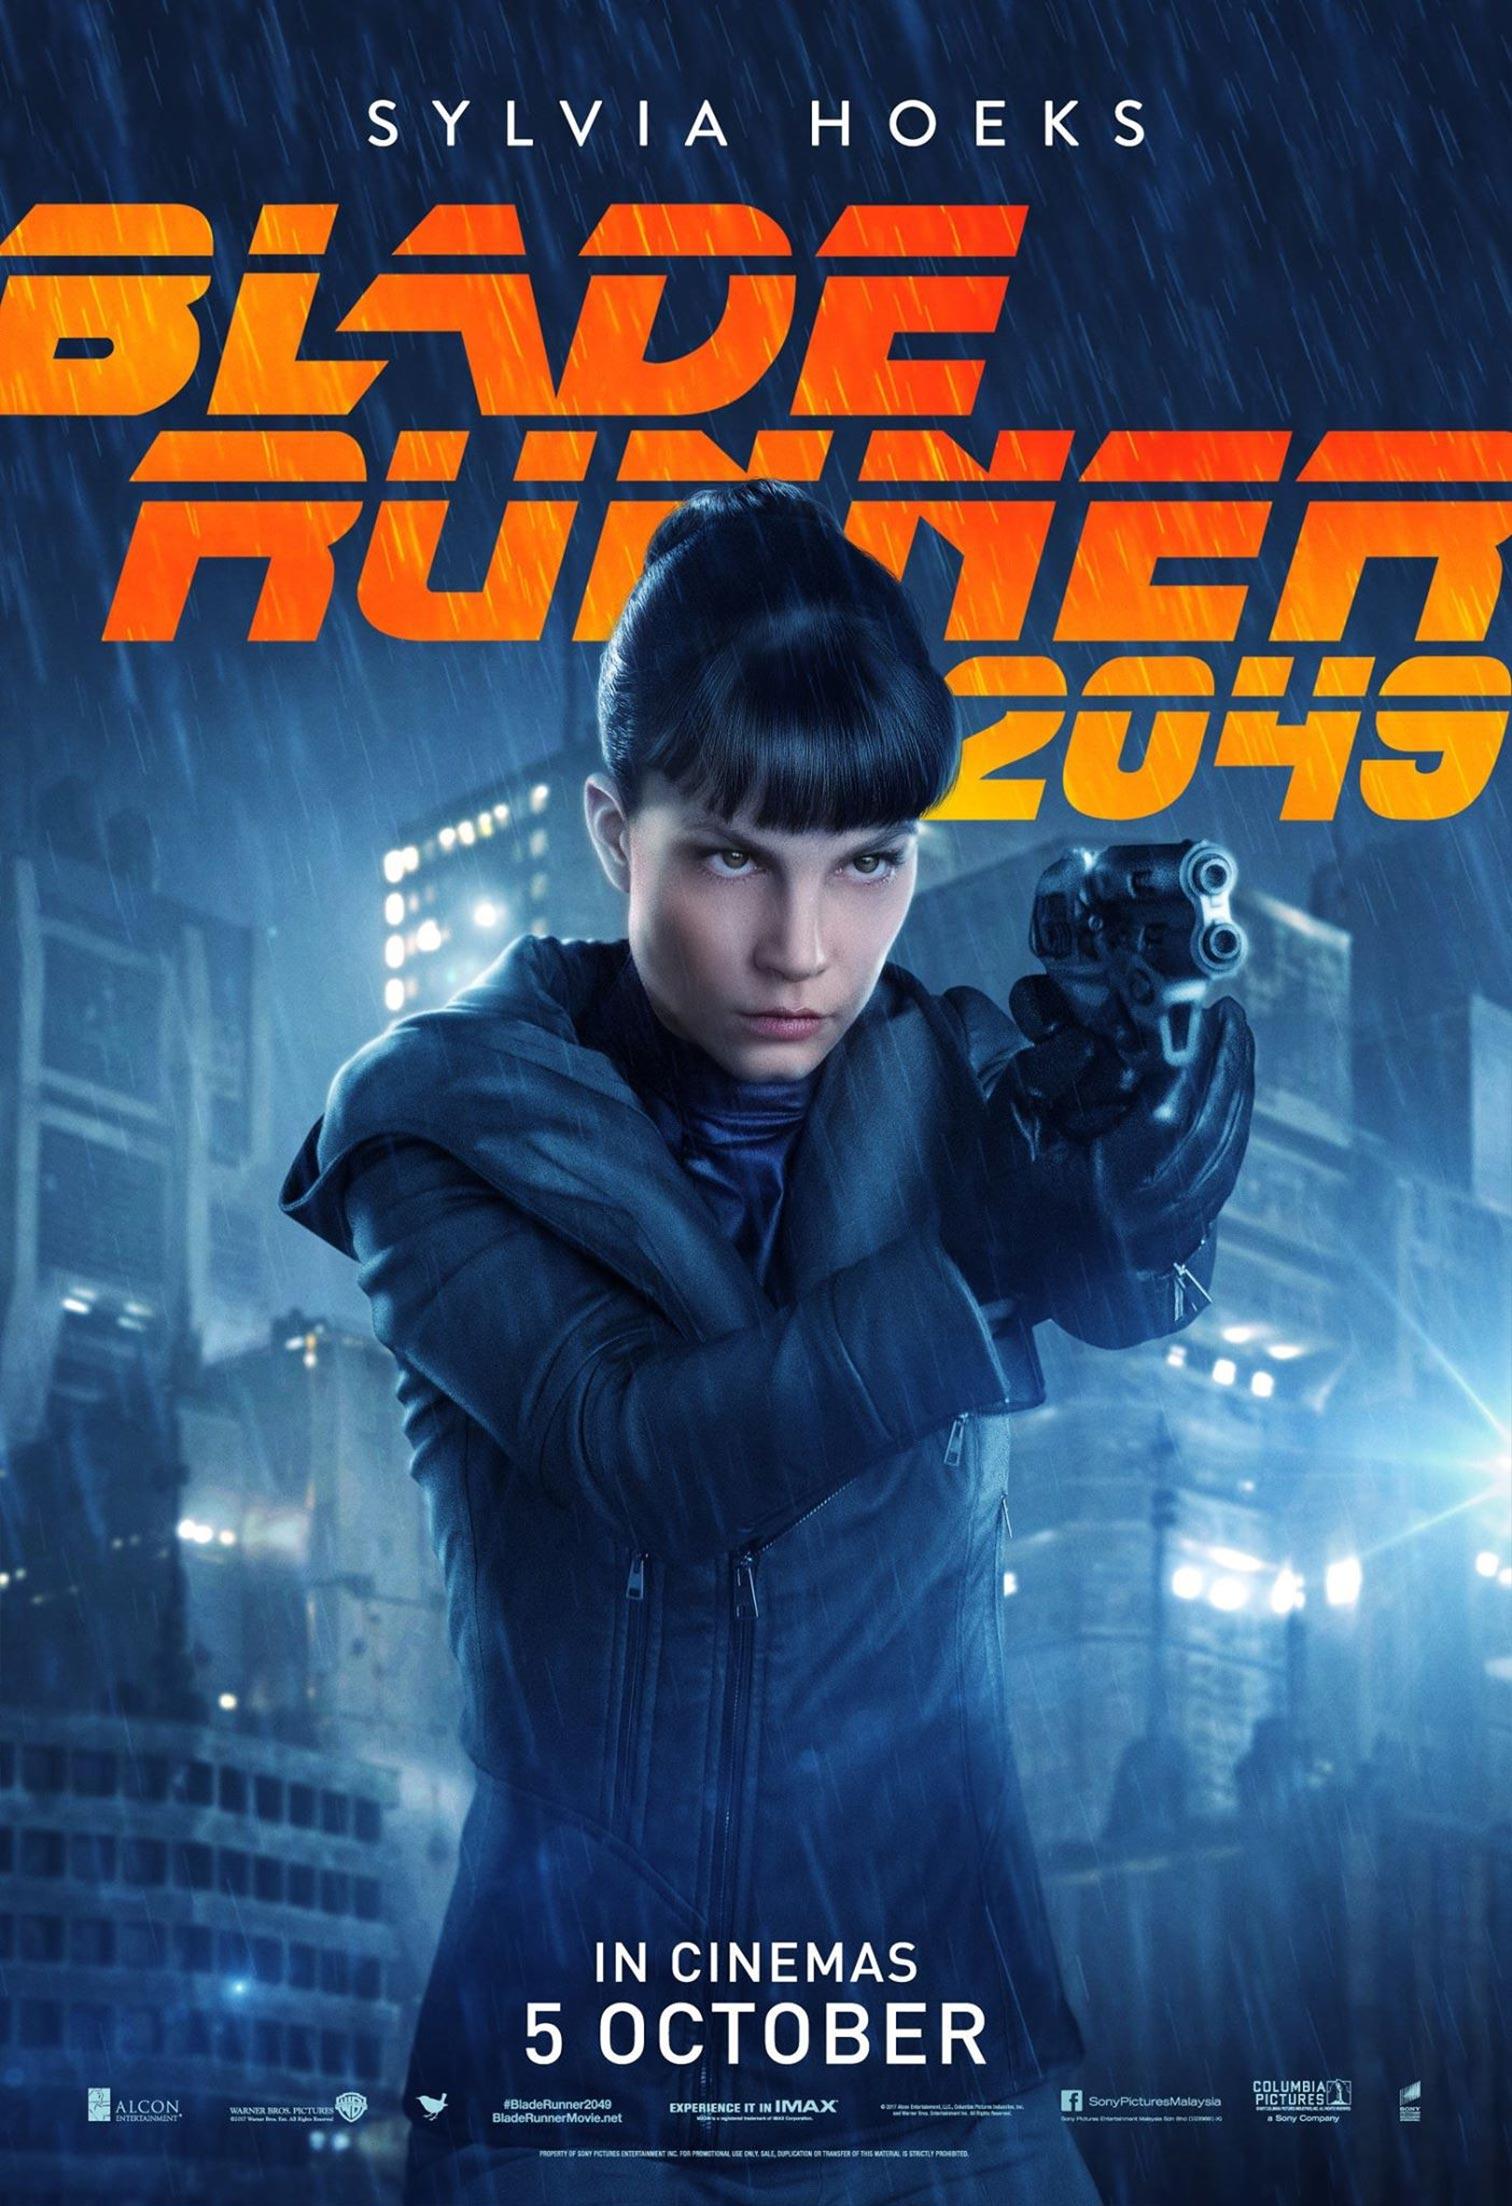 5 Reasons Blade Runner 2049 Is Better Than The Original